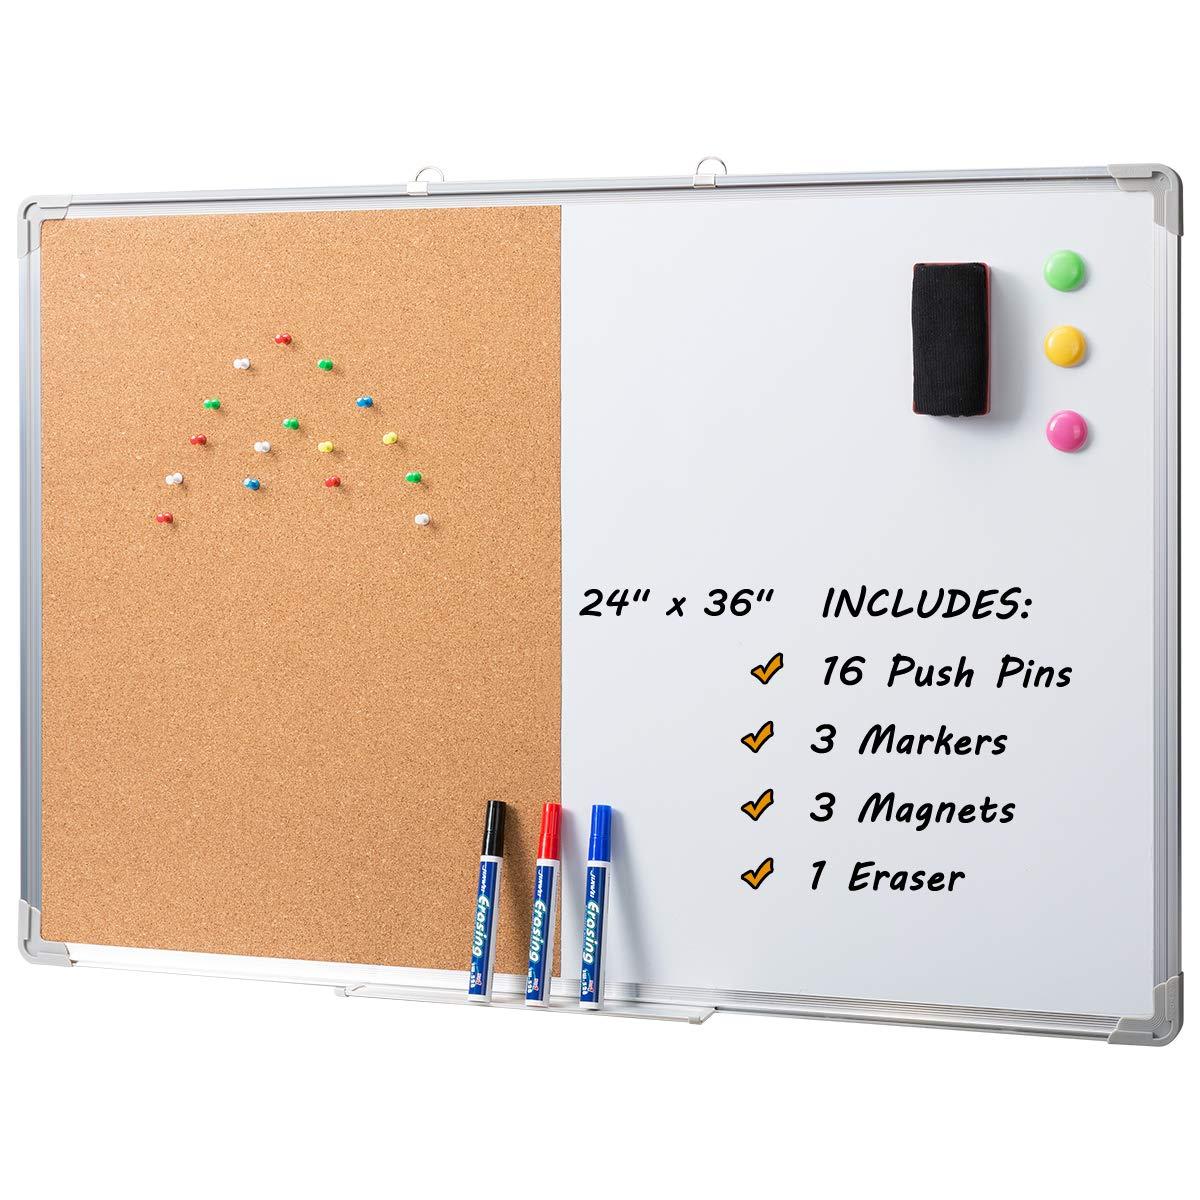 Marble Field 36 x 24 Magnetic Whiteboard & Cork Board Combo Board Set, Wall Mounted Notice Bulletin Board Dry Erase/Cork Board Combination with Aluminum Frame